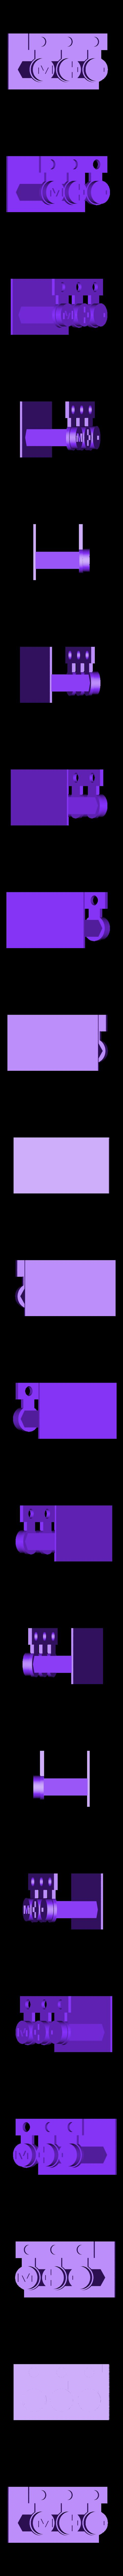 KNOB.stl Download STL file BOX for PCM2704 USB DAC • 3D printer template, URkA